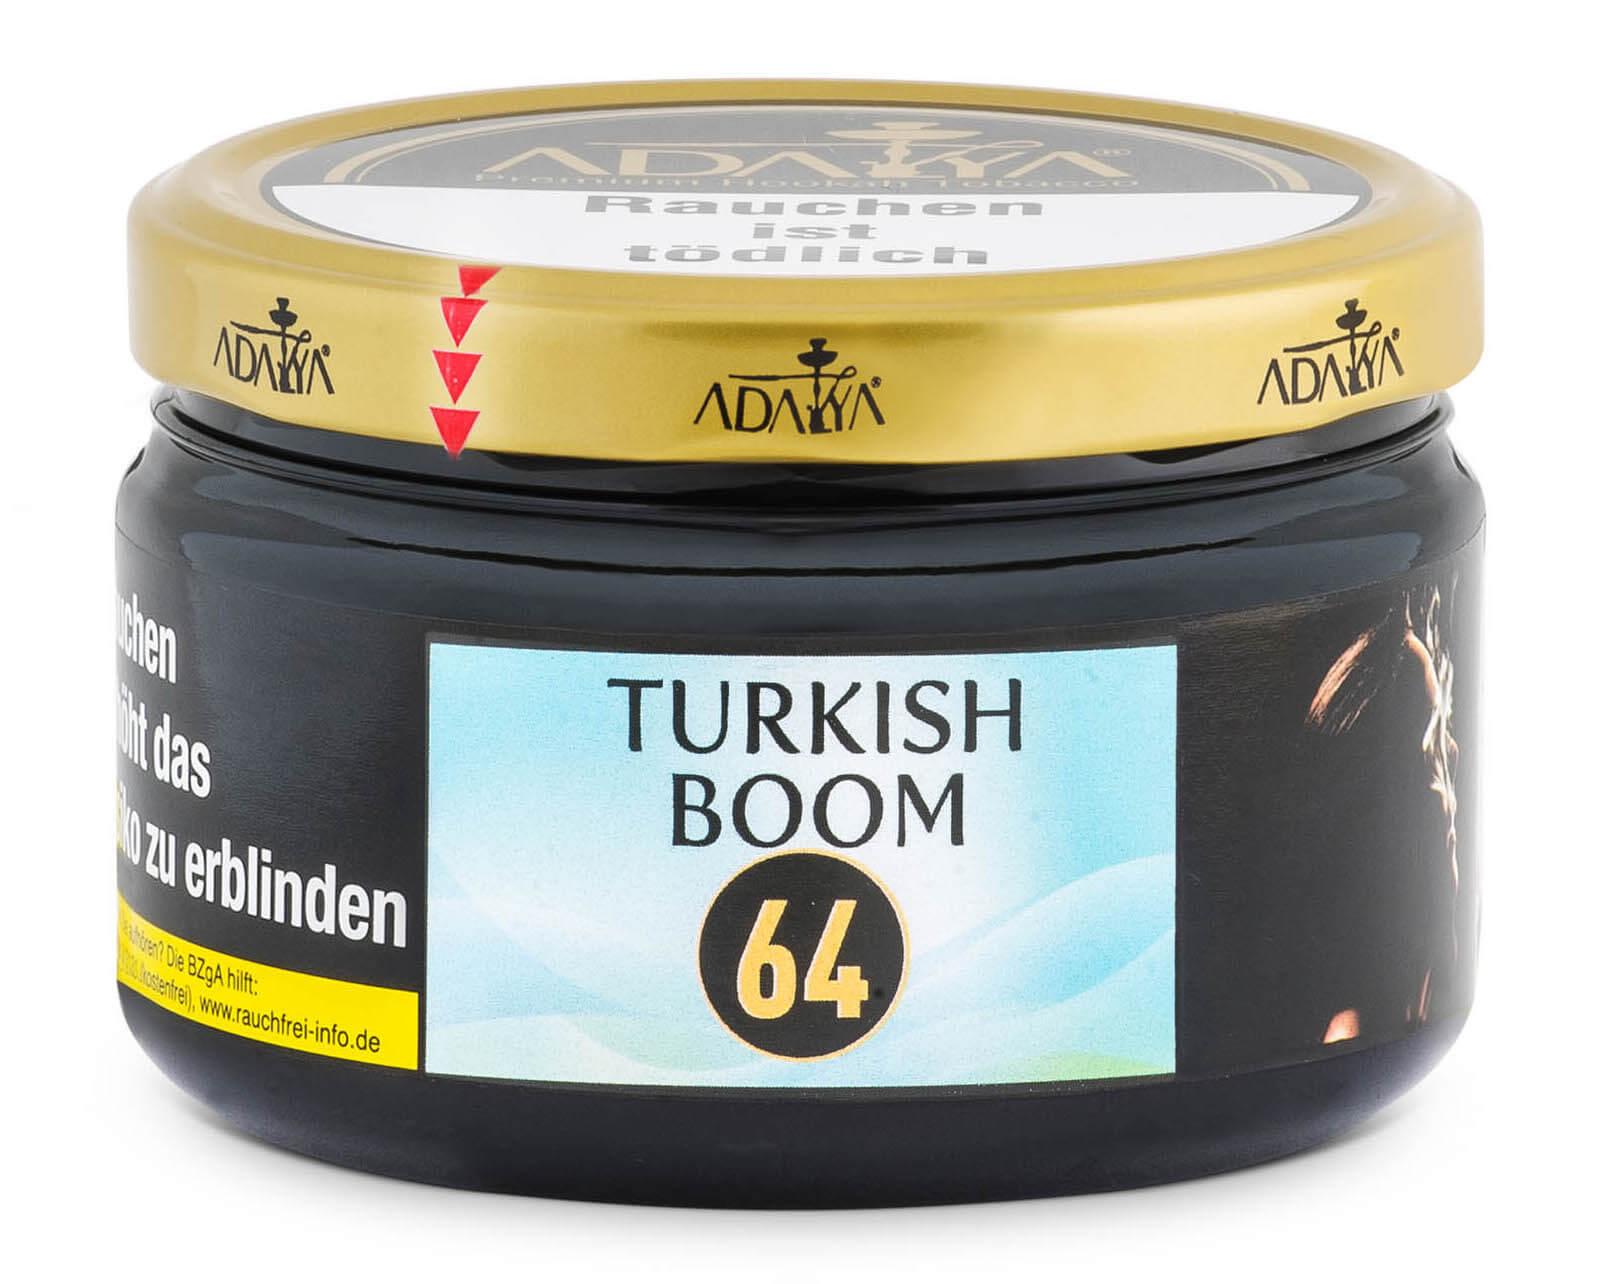 Adalya Tabak Turkish Boom #64 200g